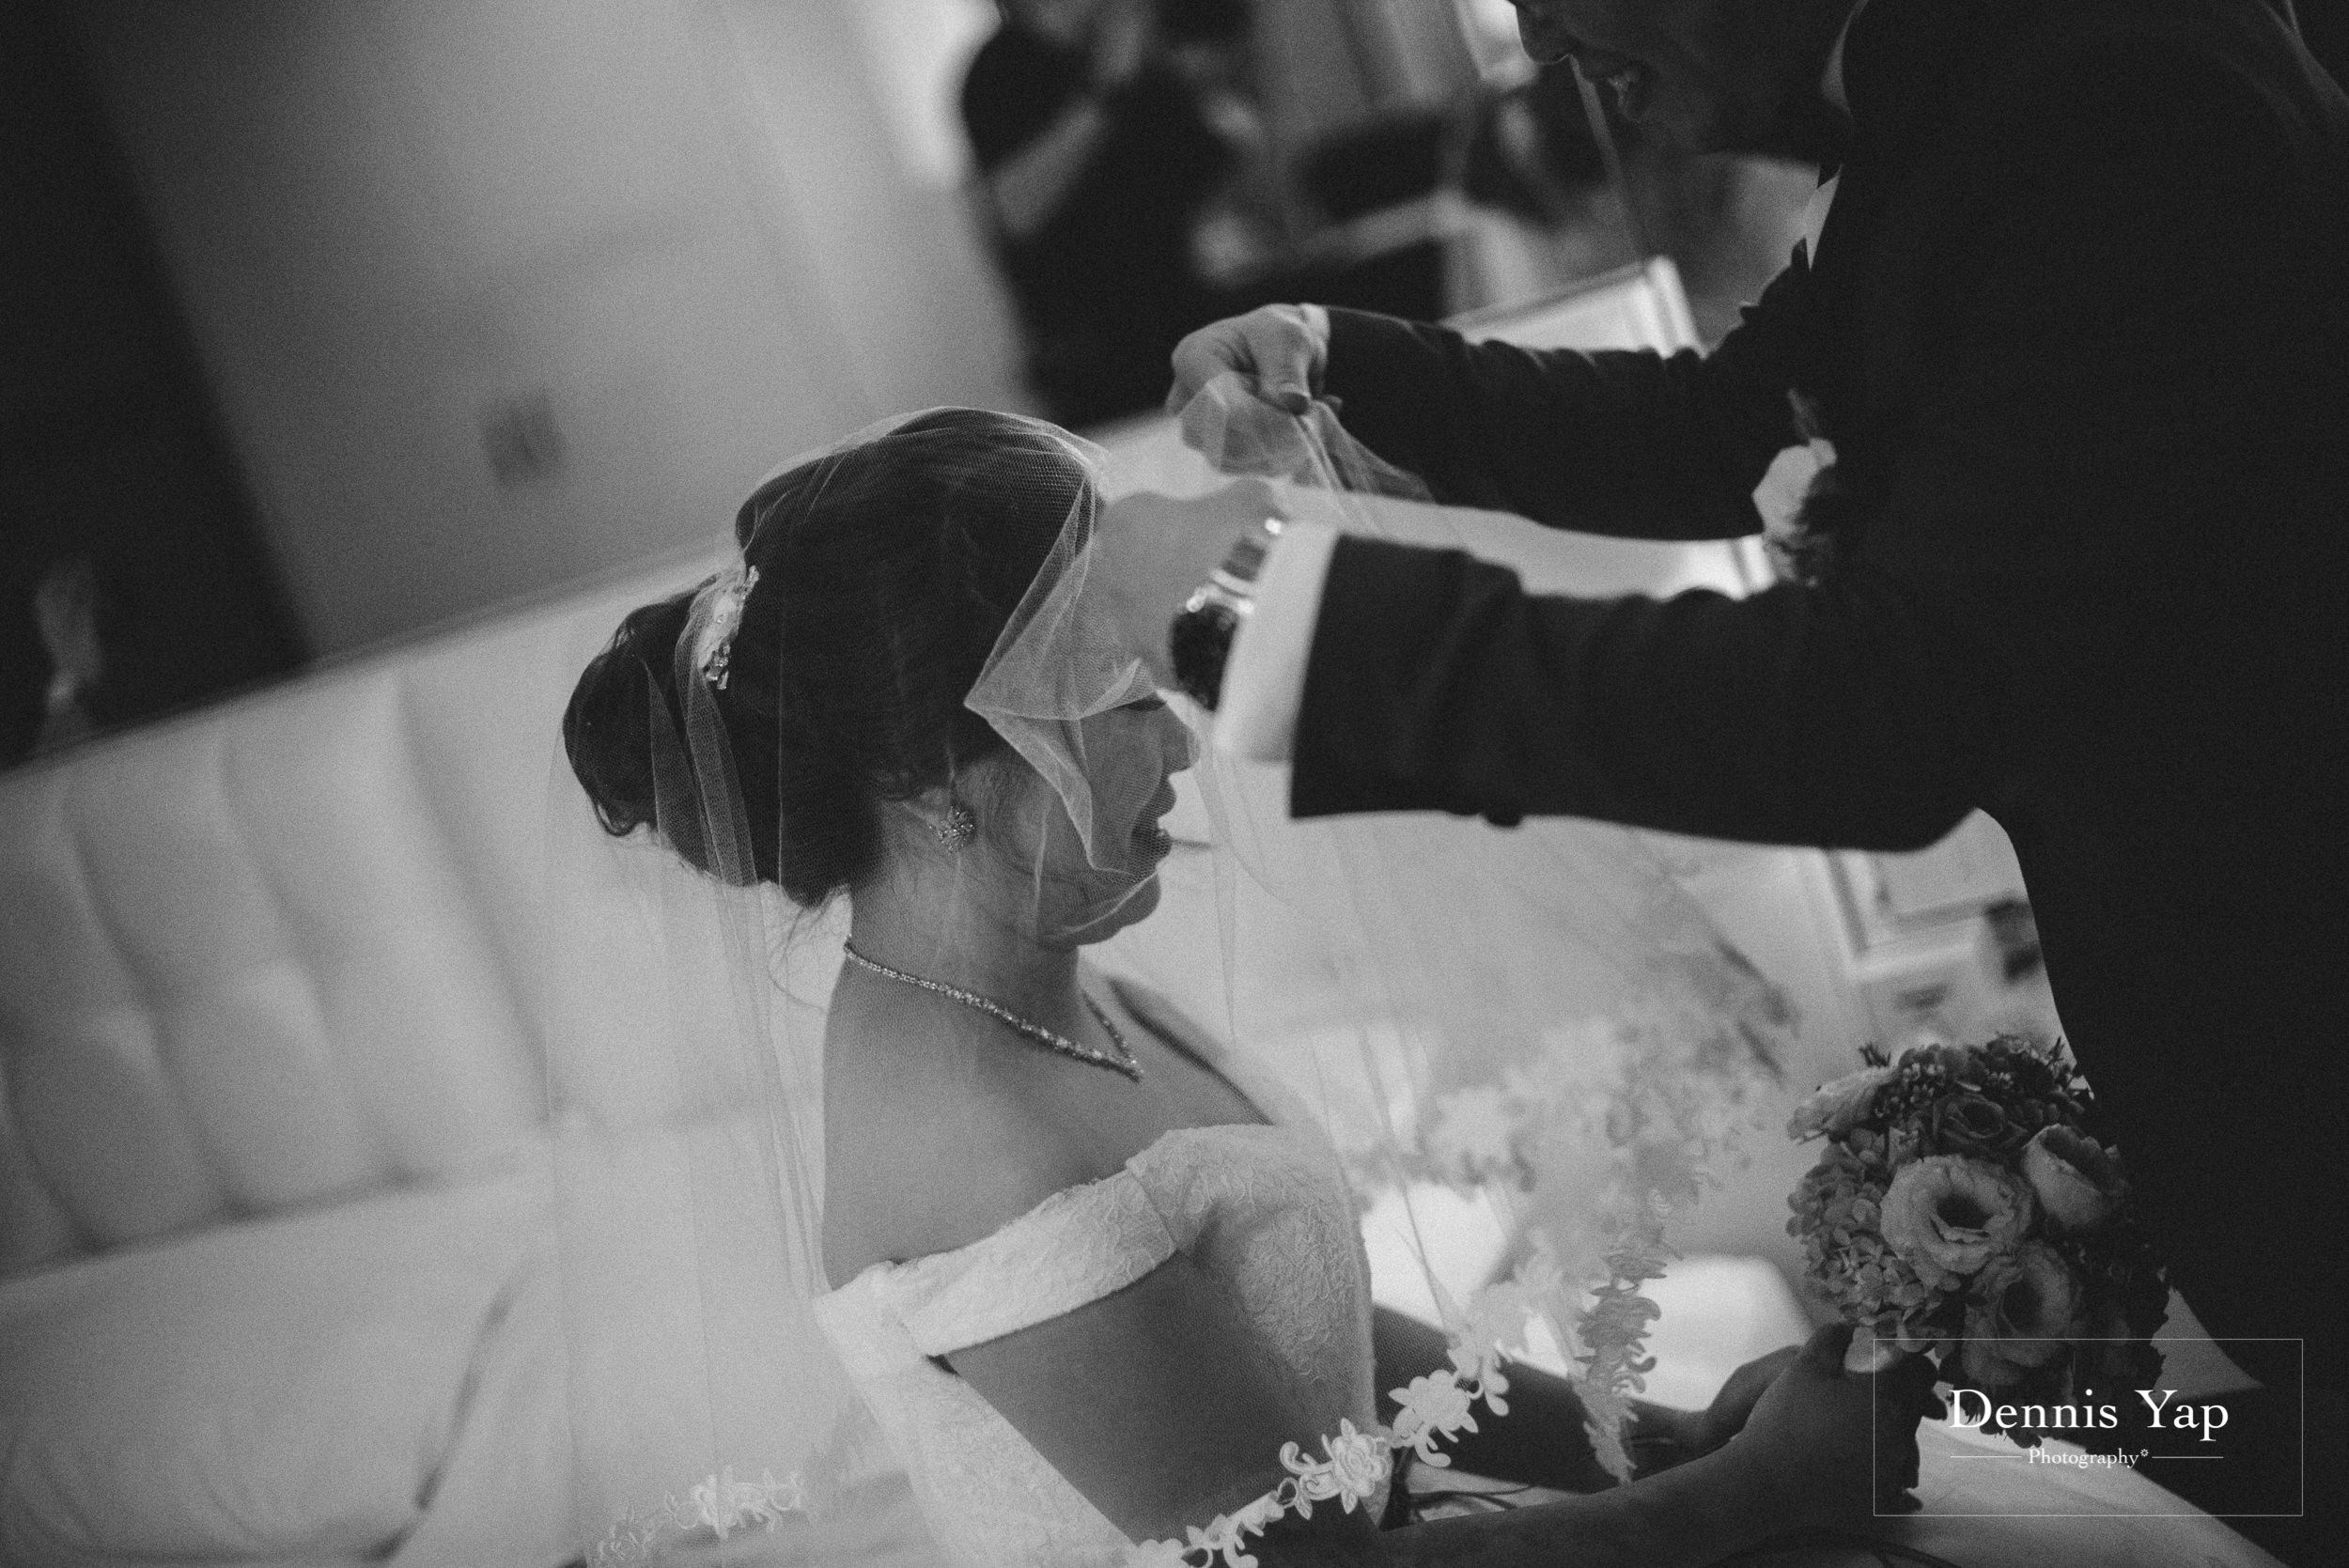 joon keat siew hui wedding day dennis yap malaysia wedding photographer-15.jpg